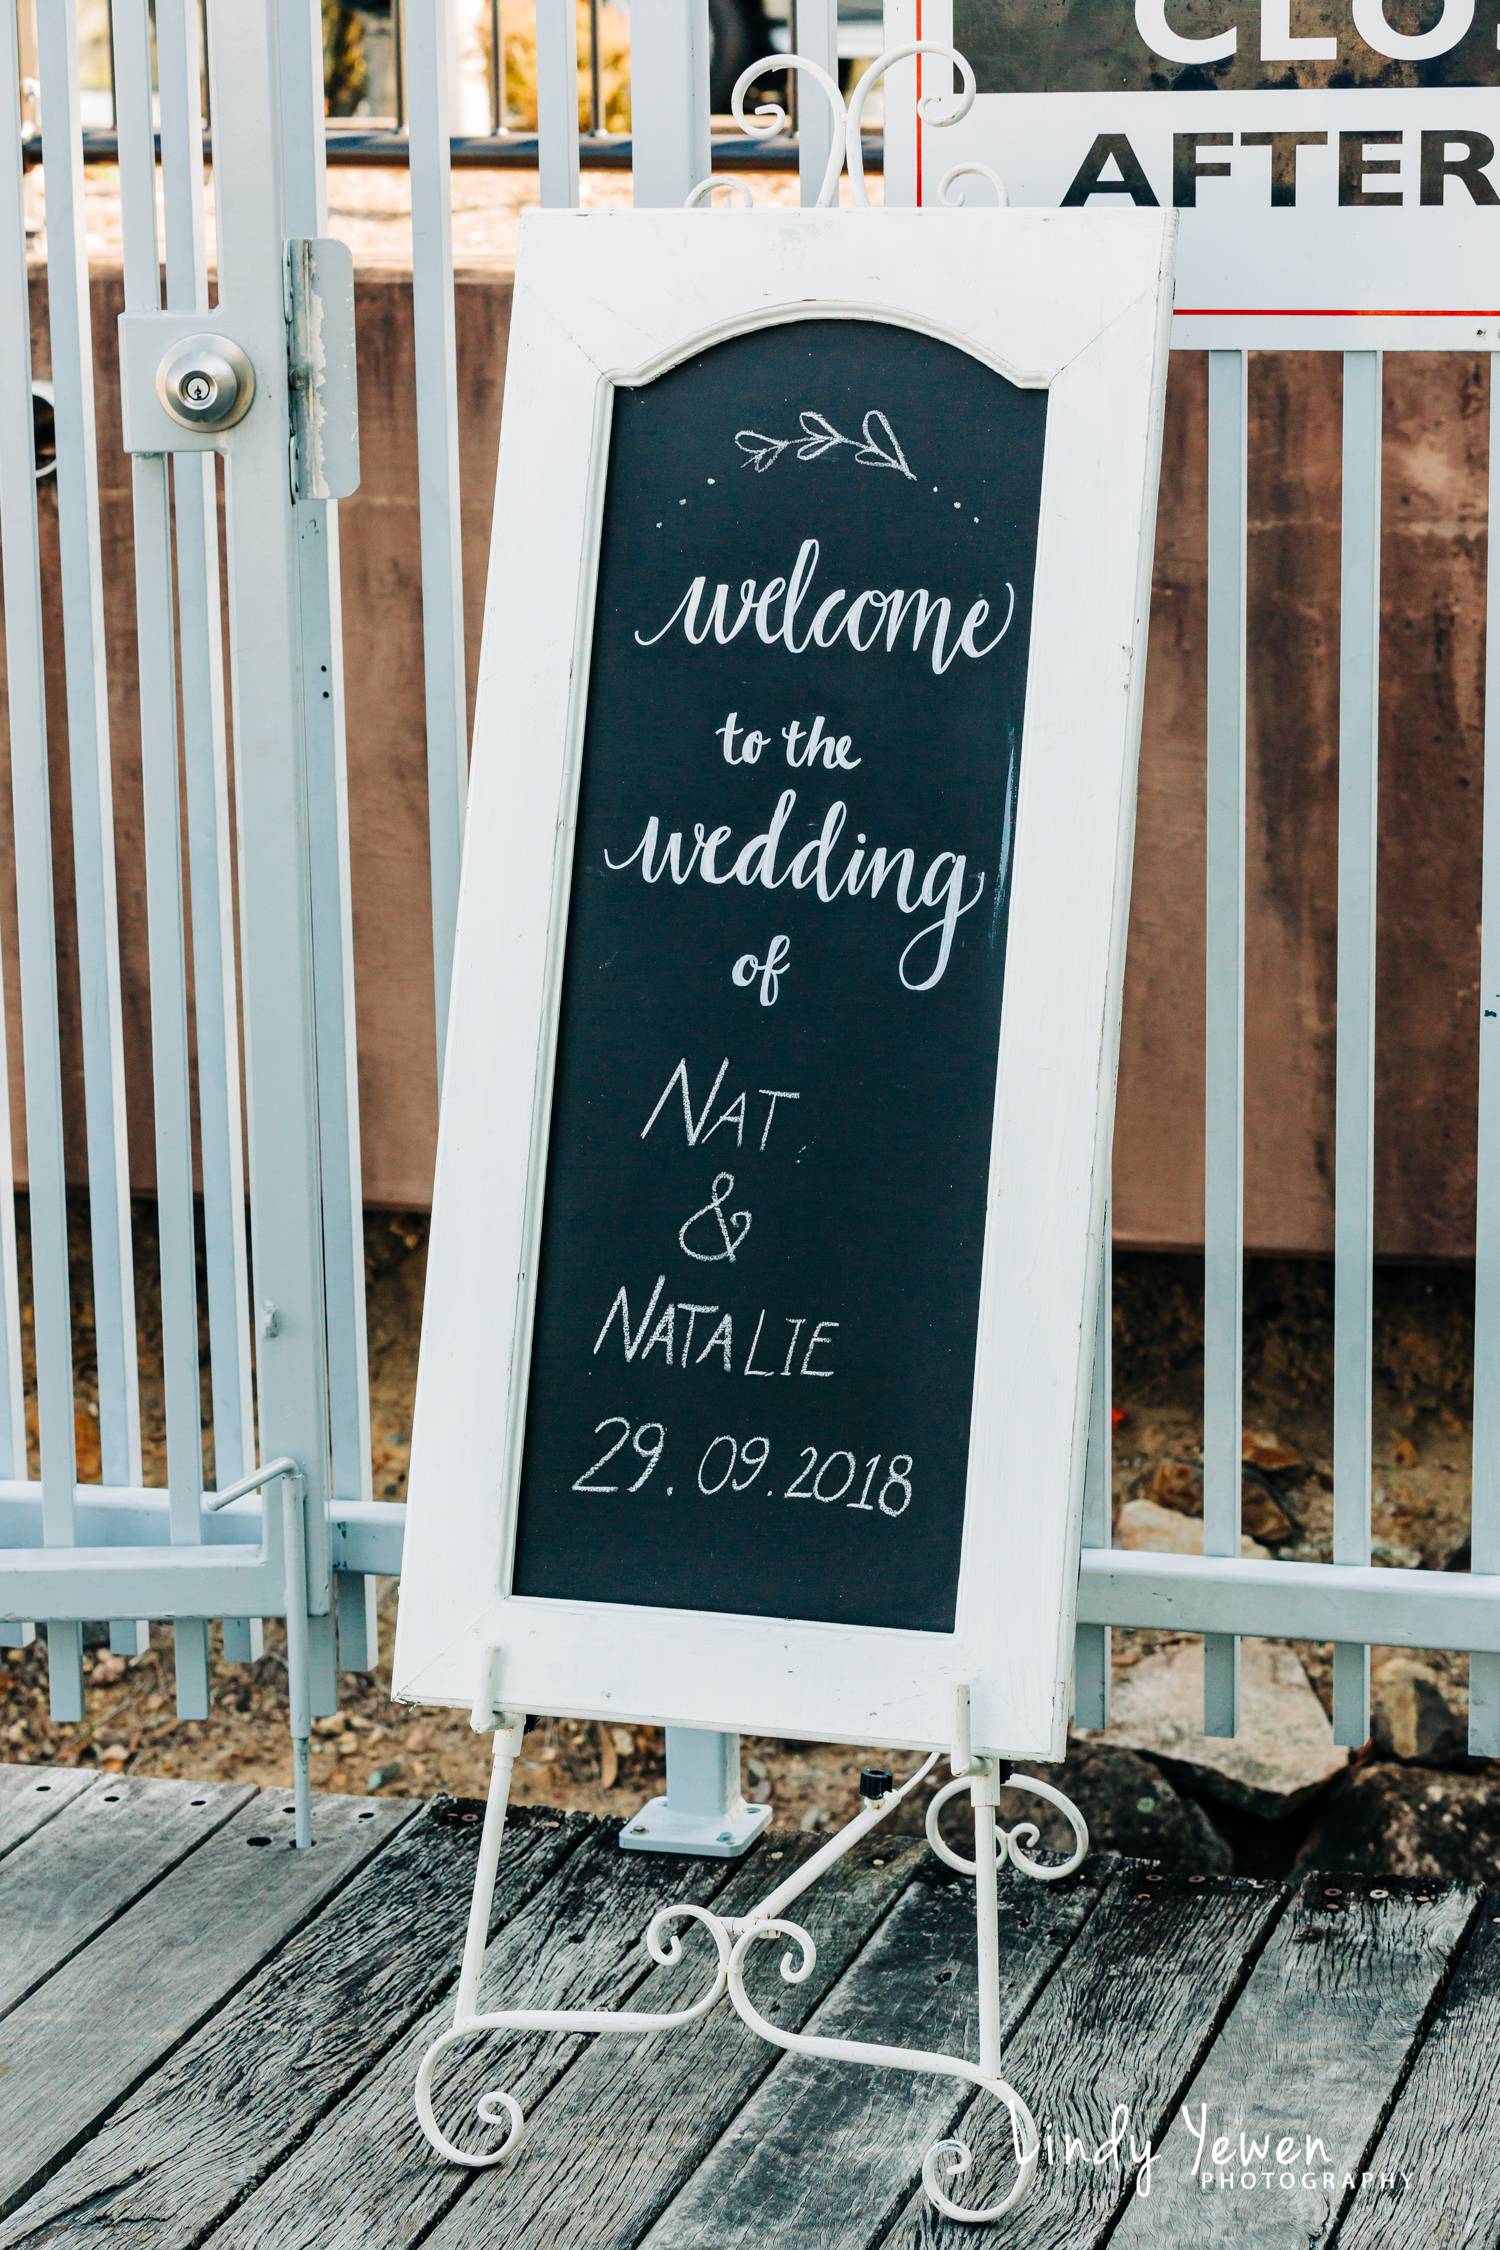 Noosa-Marina-Wedding-Nat-Natalie  82.jpg